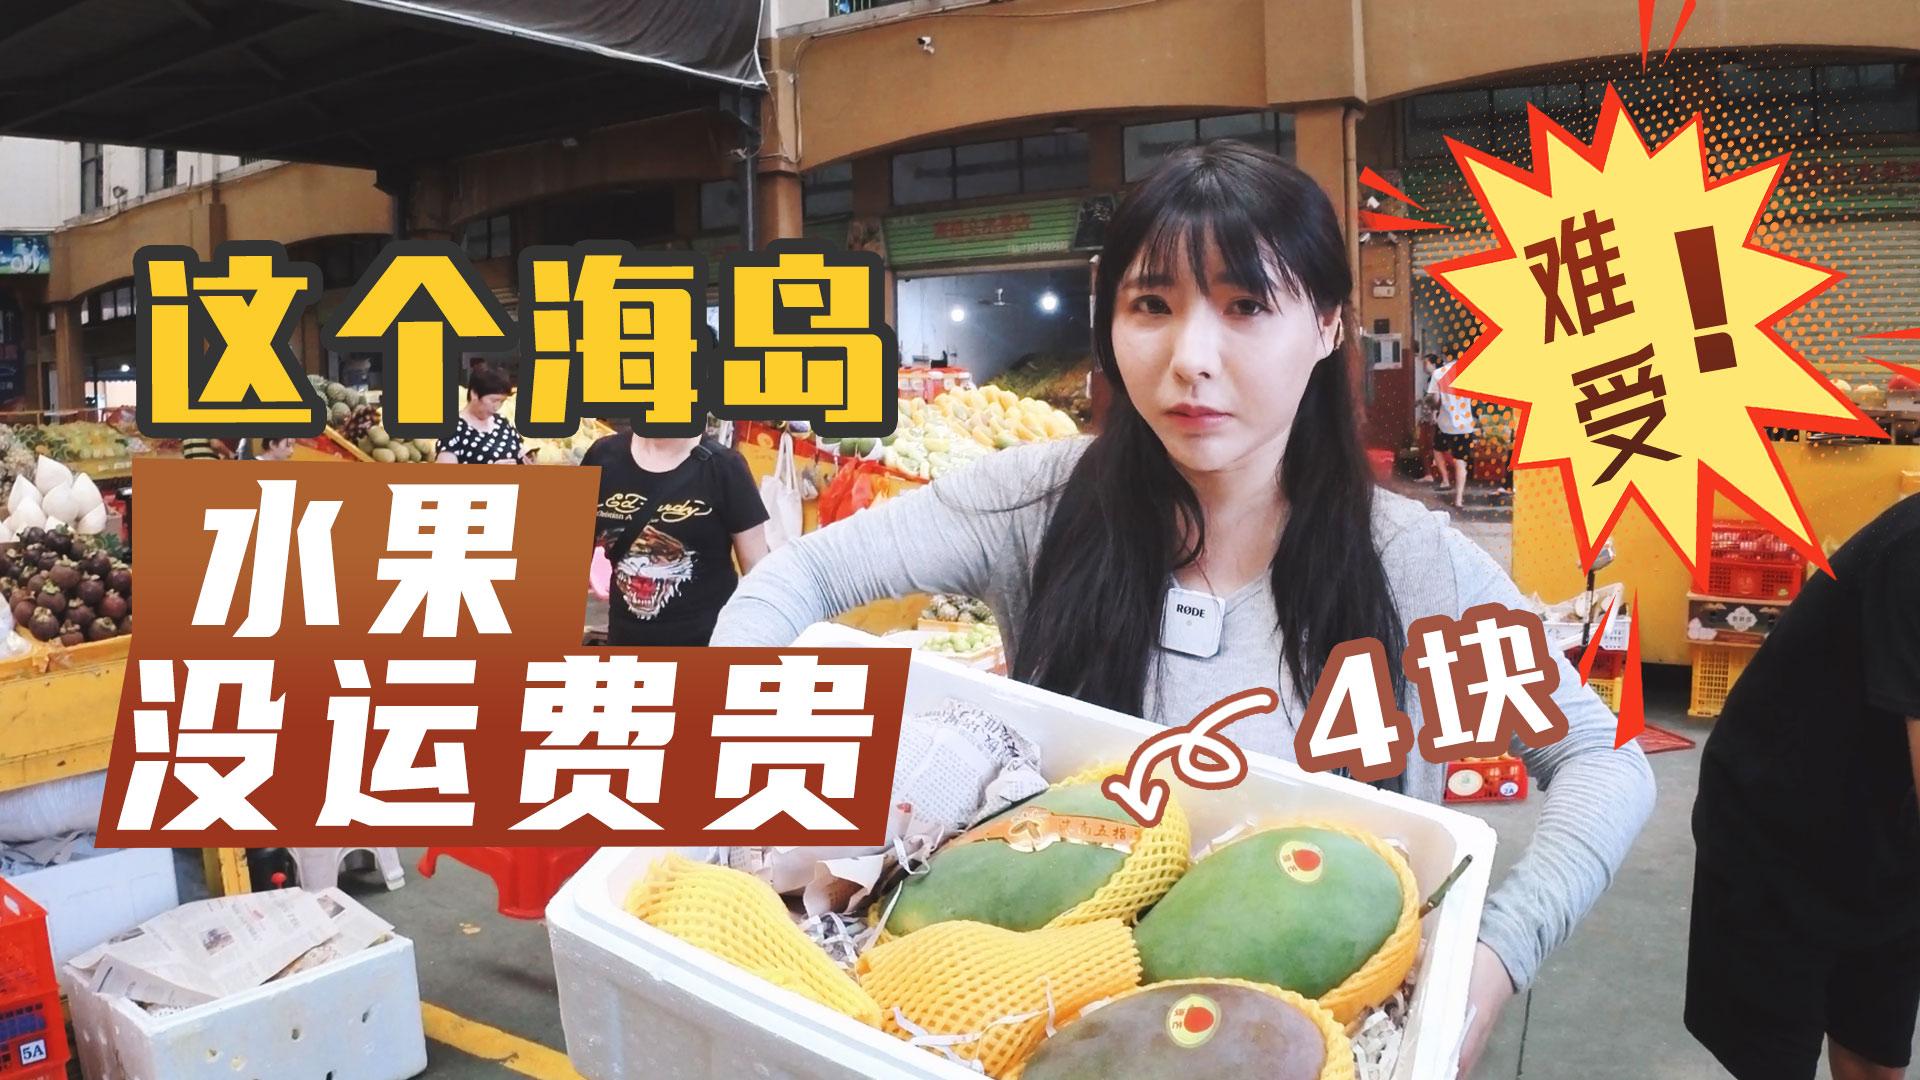 Vlog:逛三亚最便宜的水果市场,芒果一斤才4块运费就要8块,吃饱喝足别想着寄送了